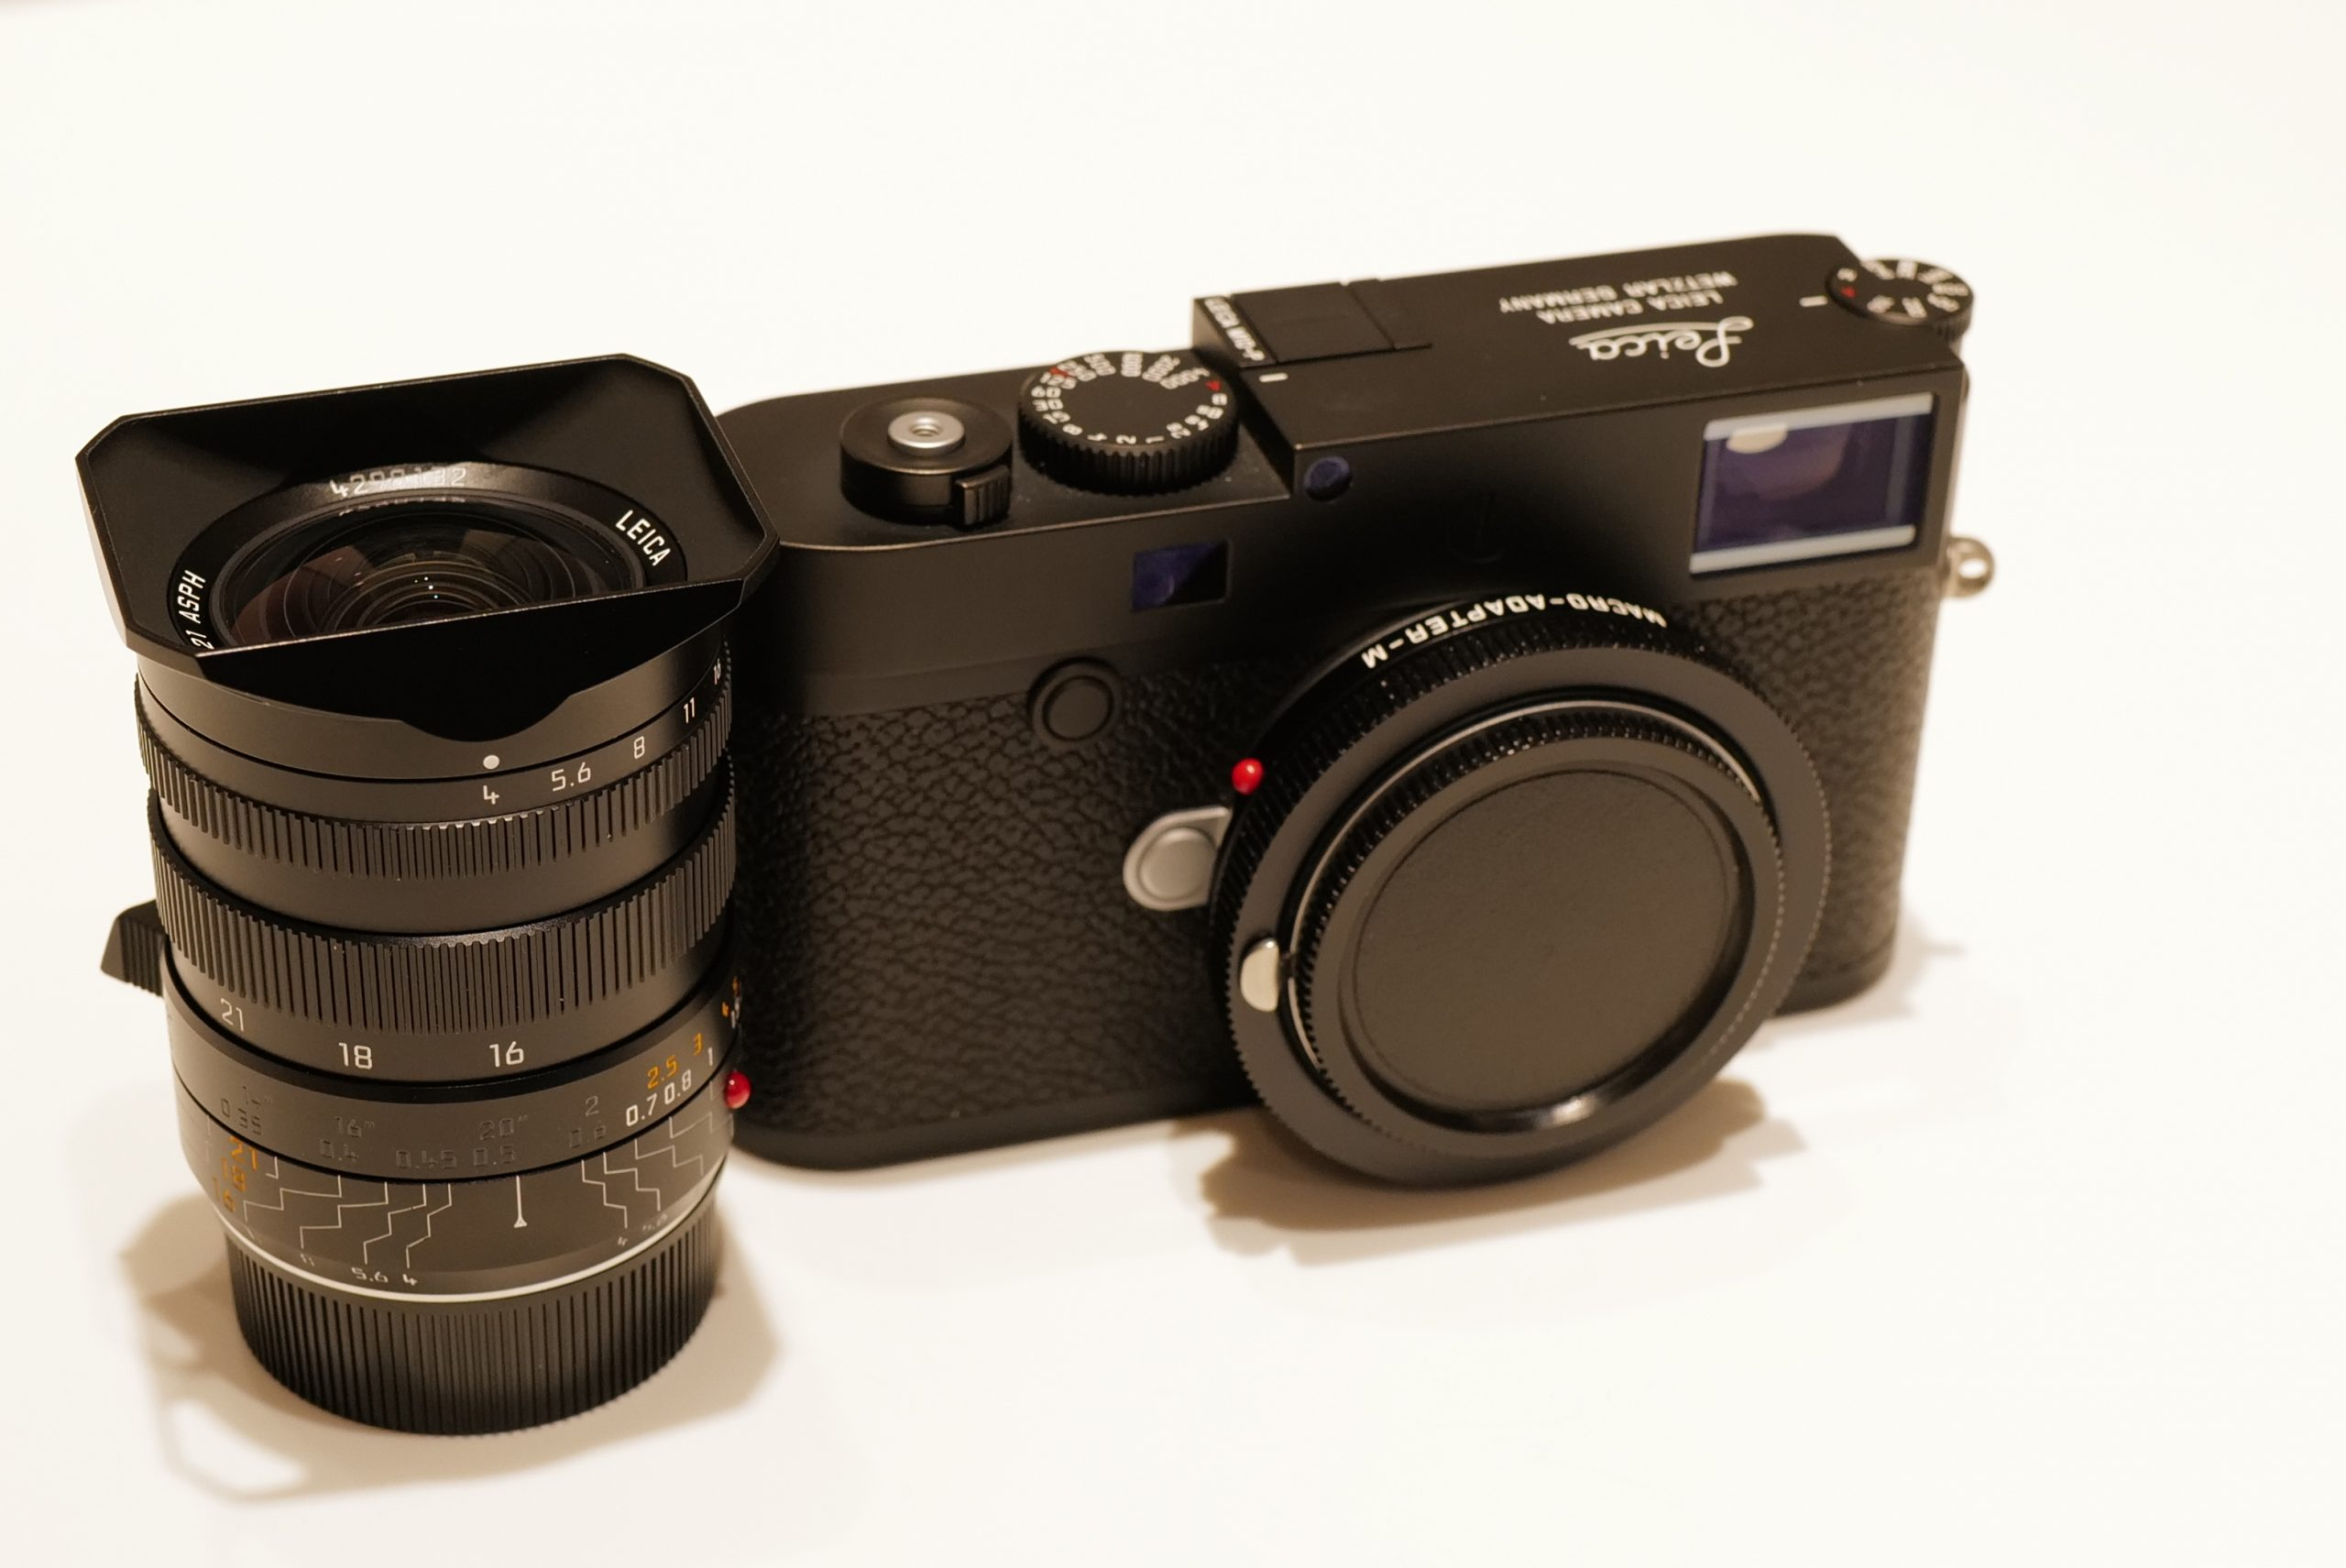 【Leica】How to Digital Leica マクロアダプターM Typ240 番外編